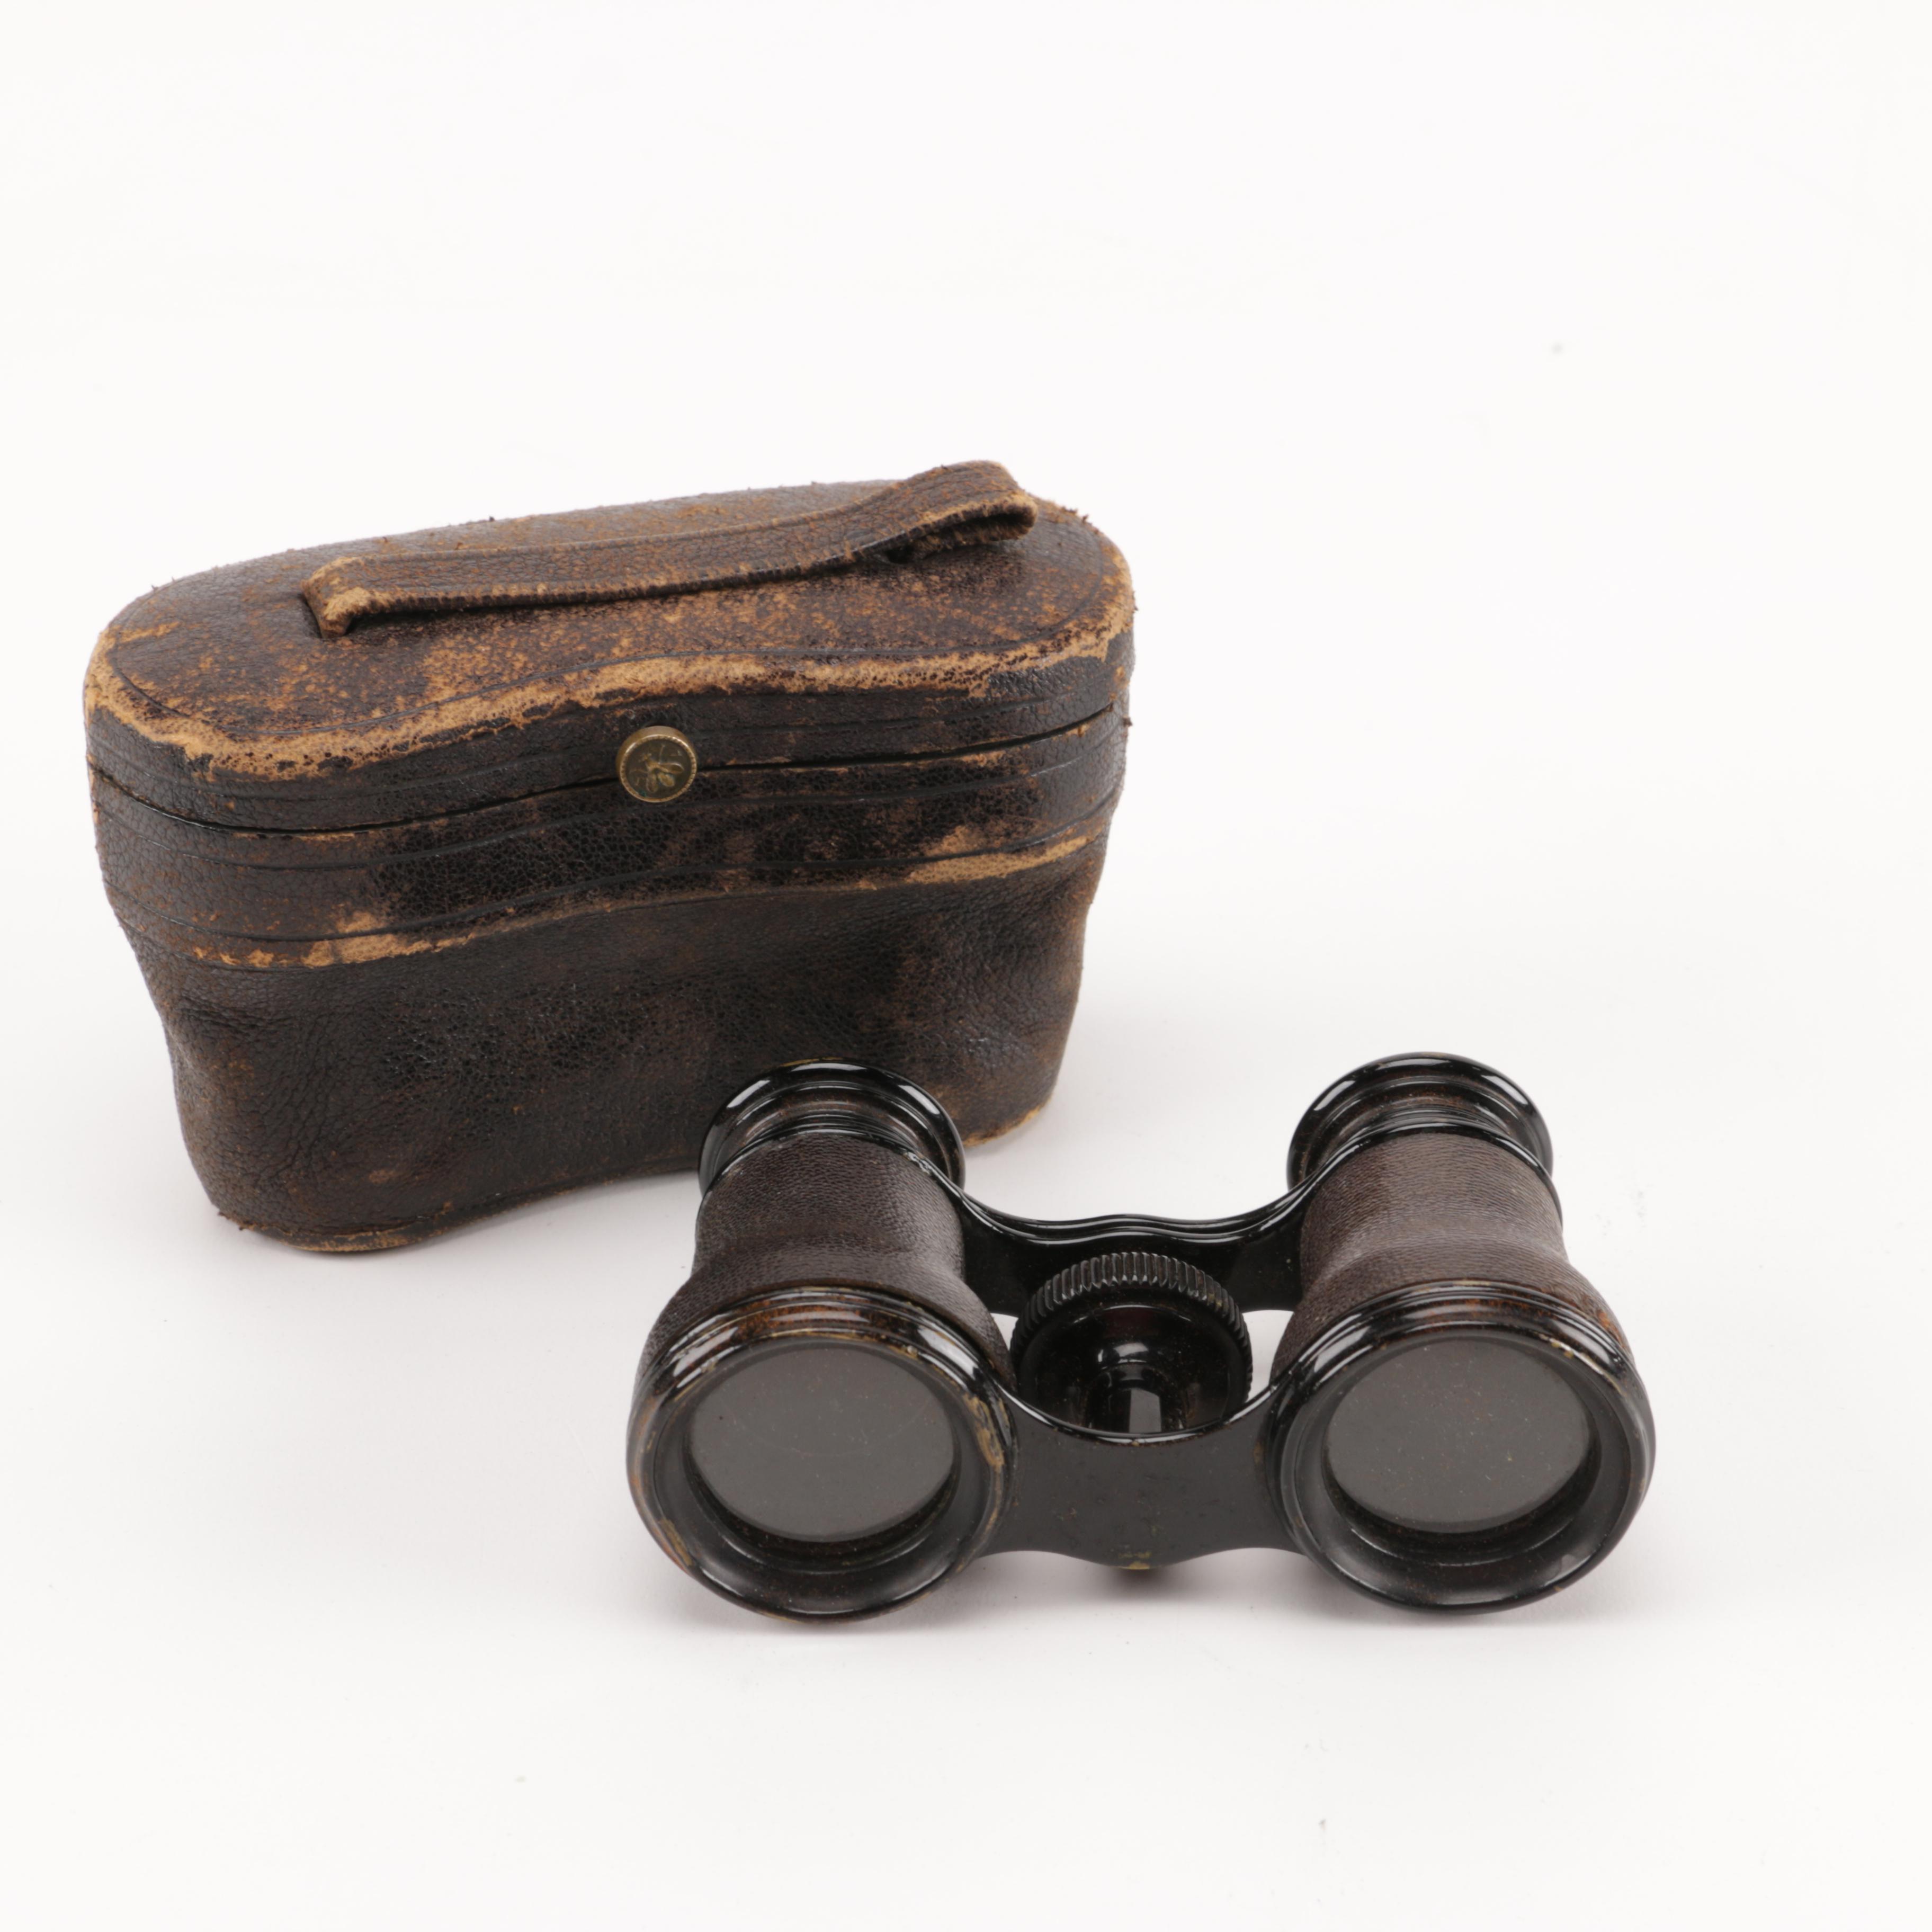 LeMaire Fabt Paris Binoculars in Leather Case